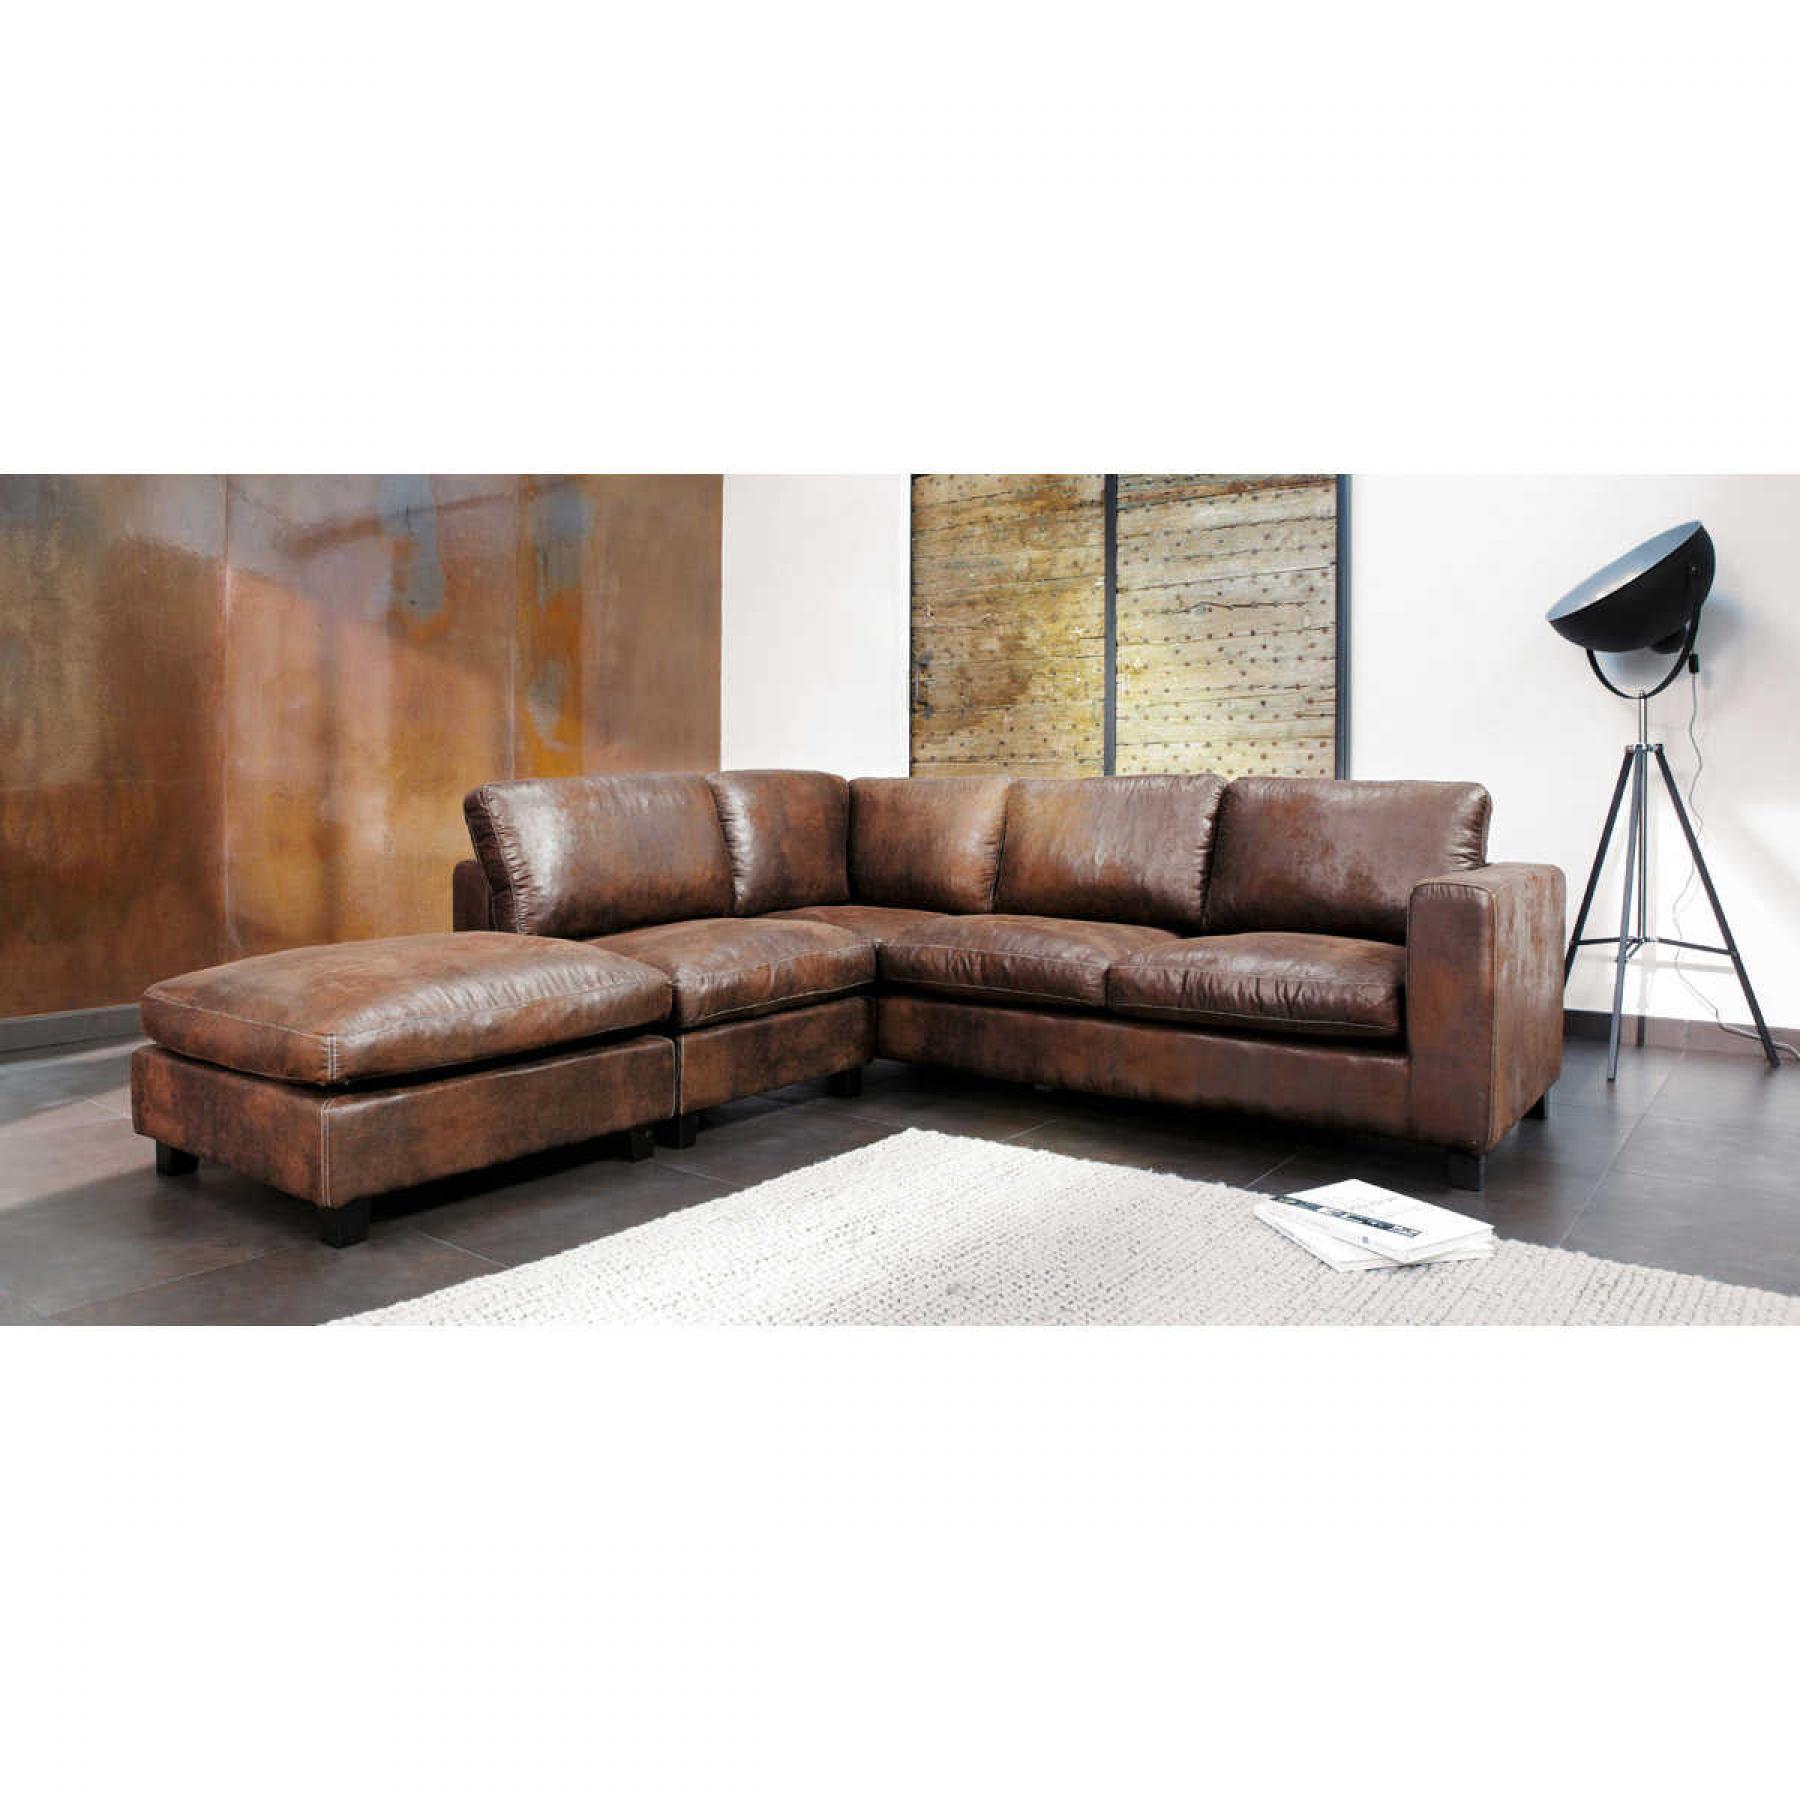 canape d angle cuir vieilli images. Black Bedroom Furniture Sets. Home Design Ideas